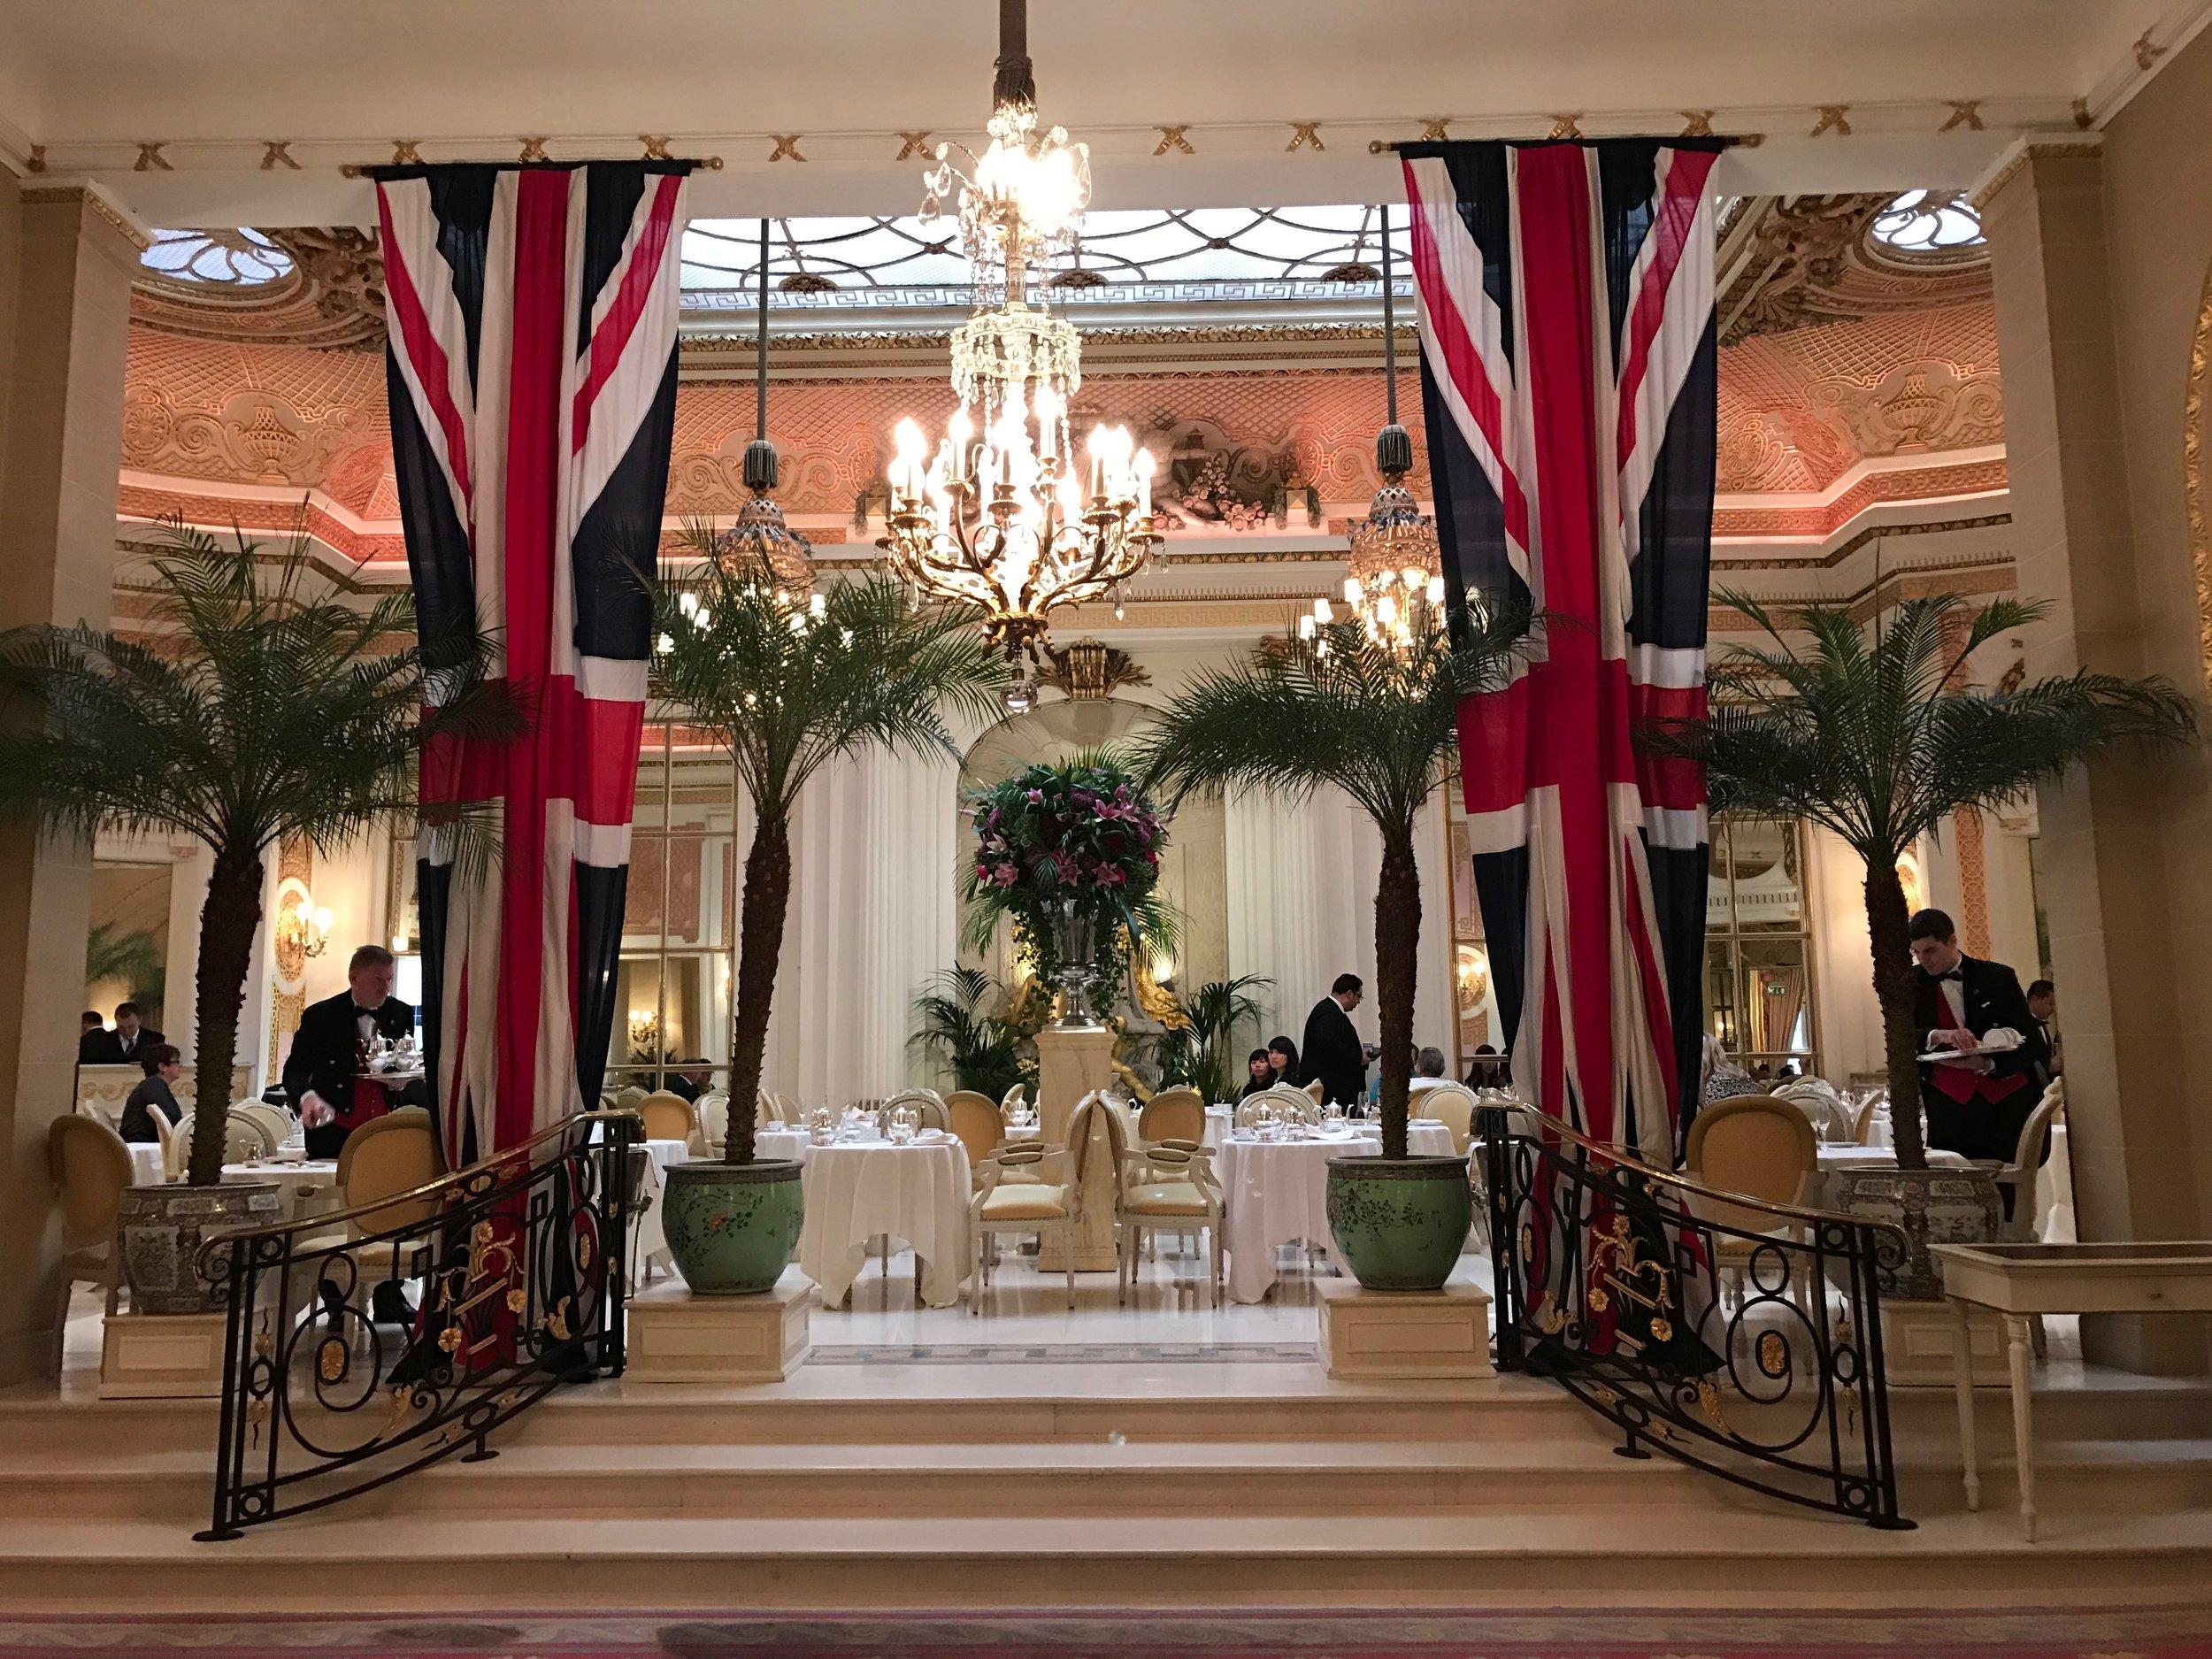 Palm Court at The Ritz London - #Kurtantravels London Travel Guide Part 2 - BySarahRae.com